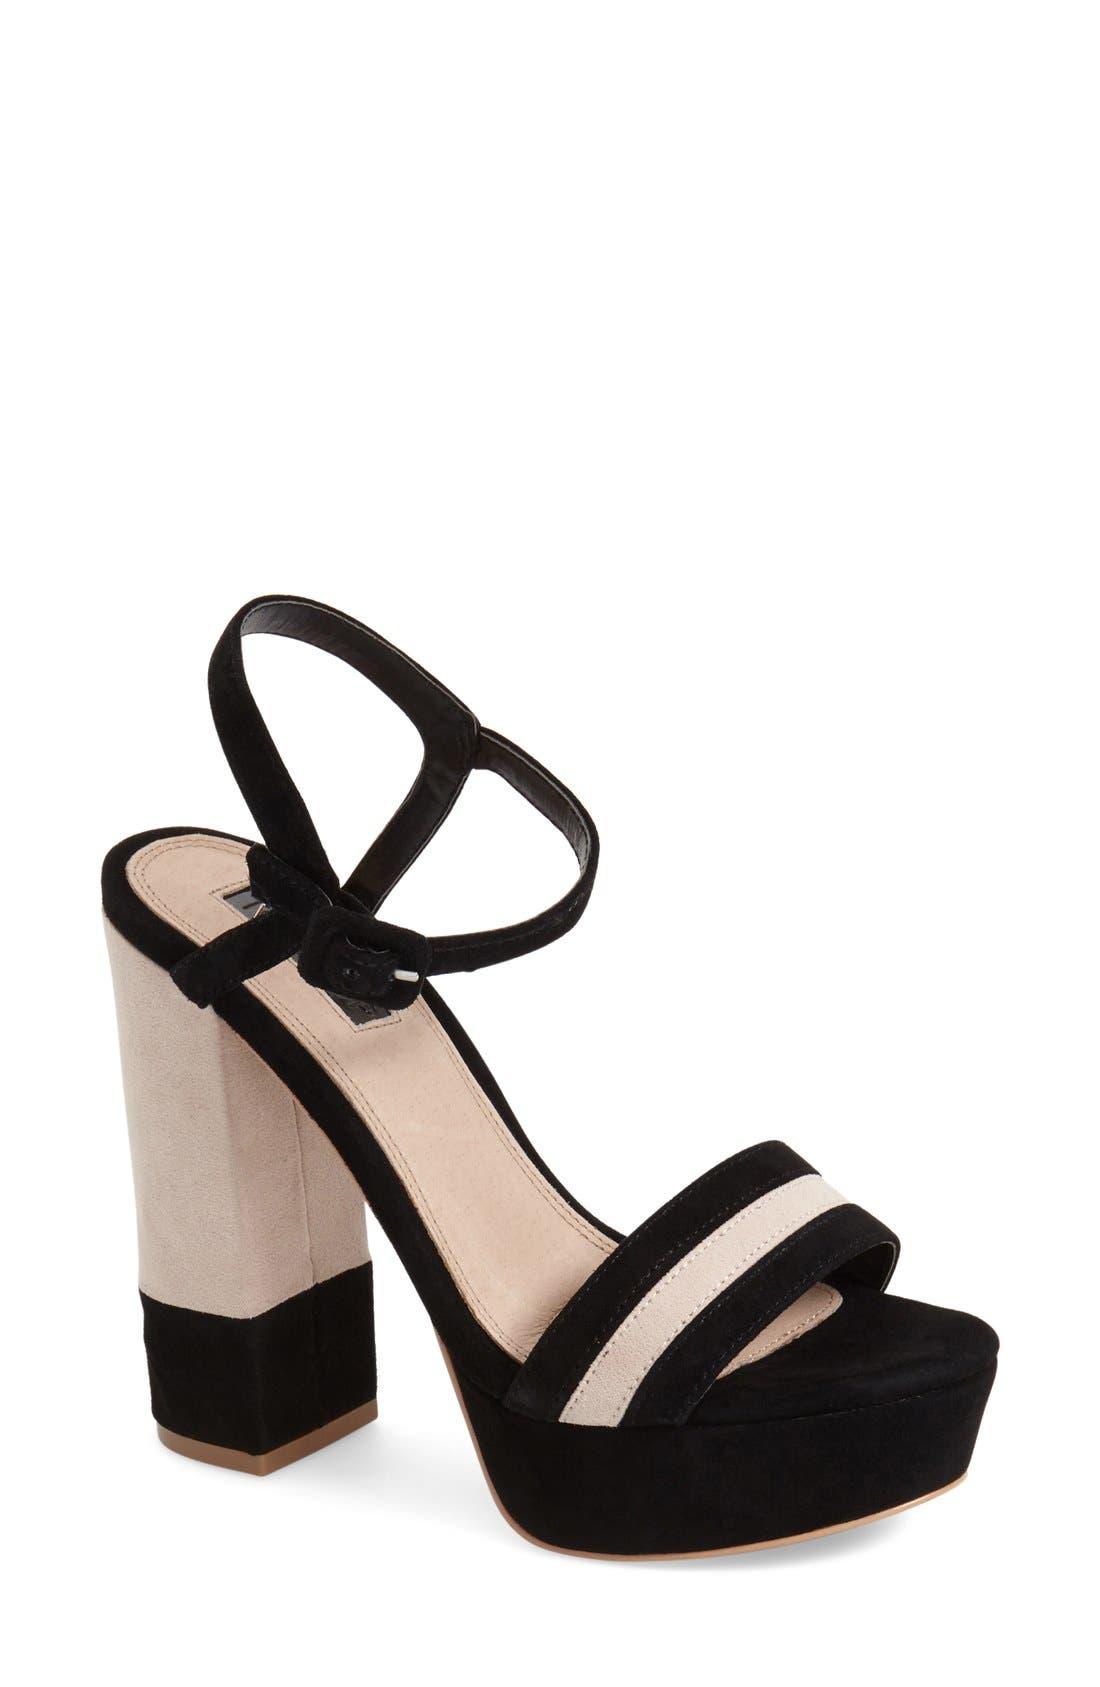 Alternate Image 1 Selected - Topshop 'Laker' Platform Sandal (Women)